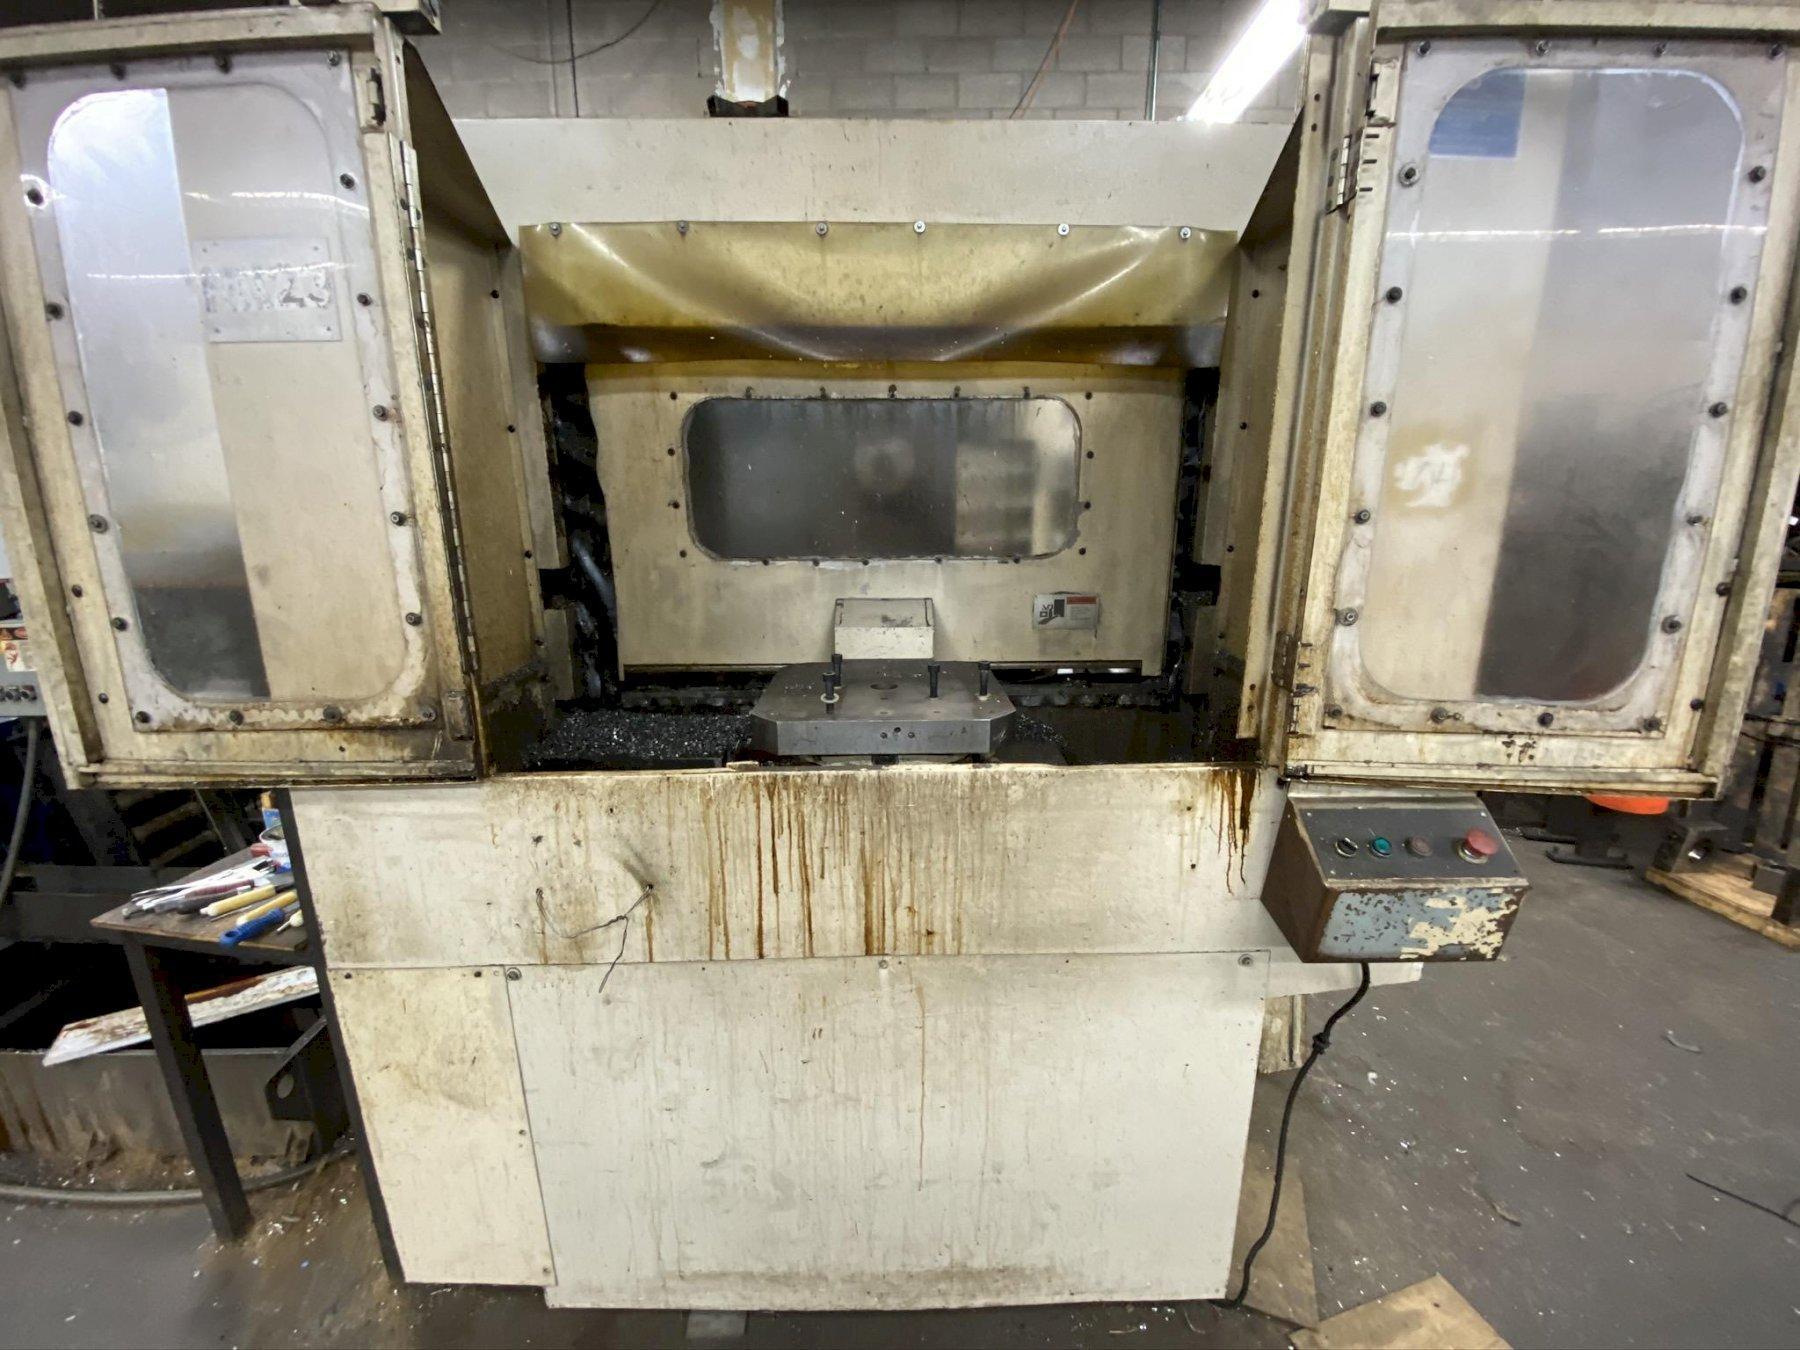 MITSUBISHIMitsubishi MH5A CNC Horizontal  Machining Center